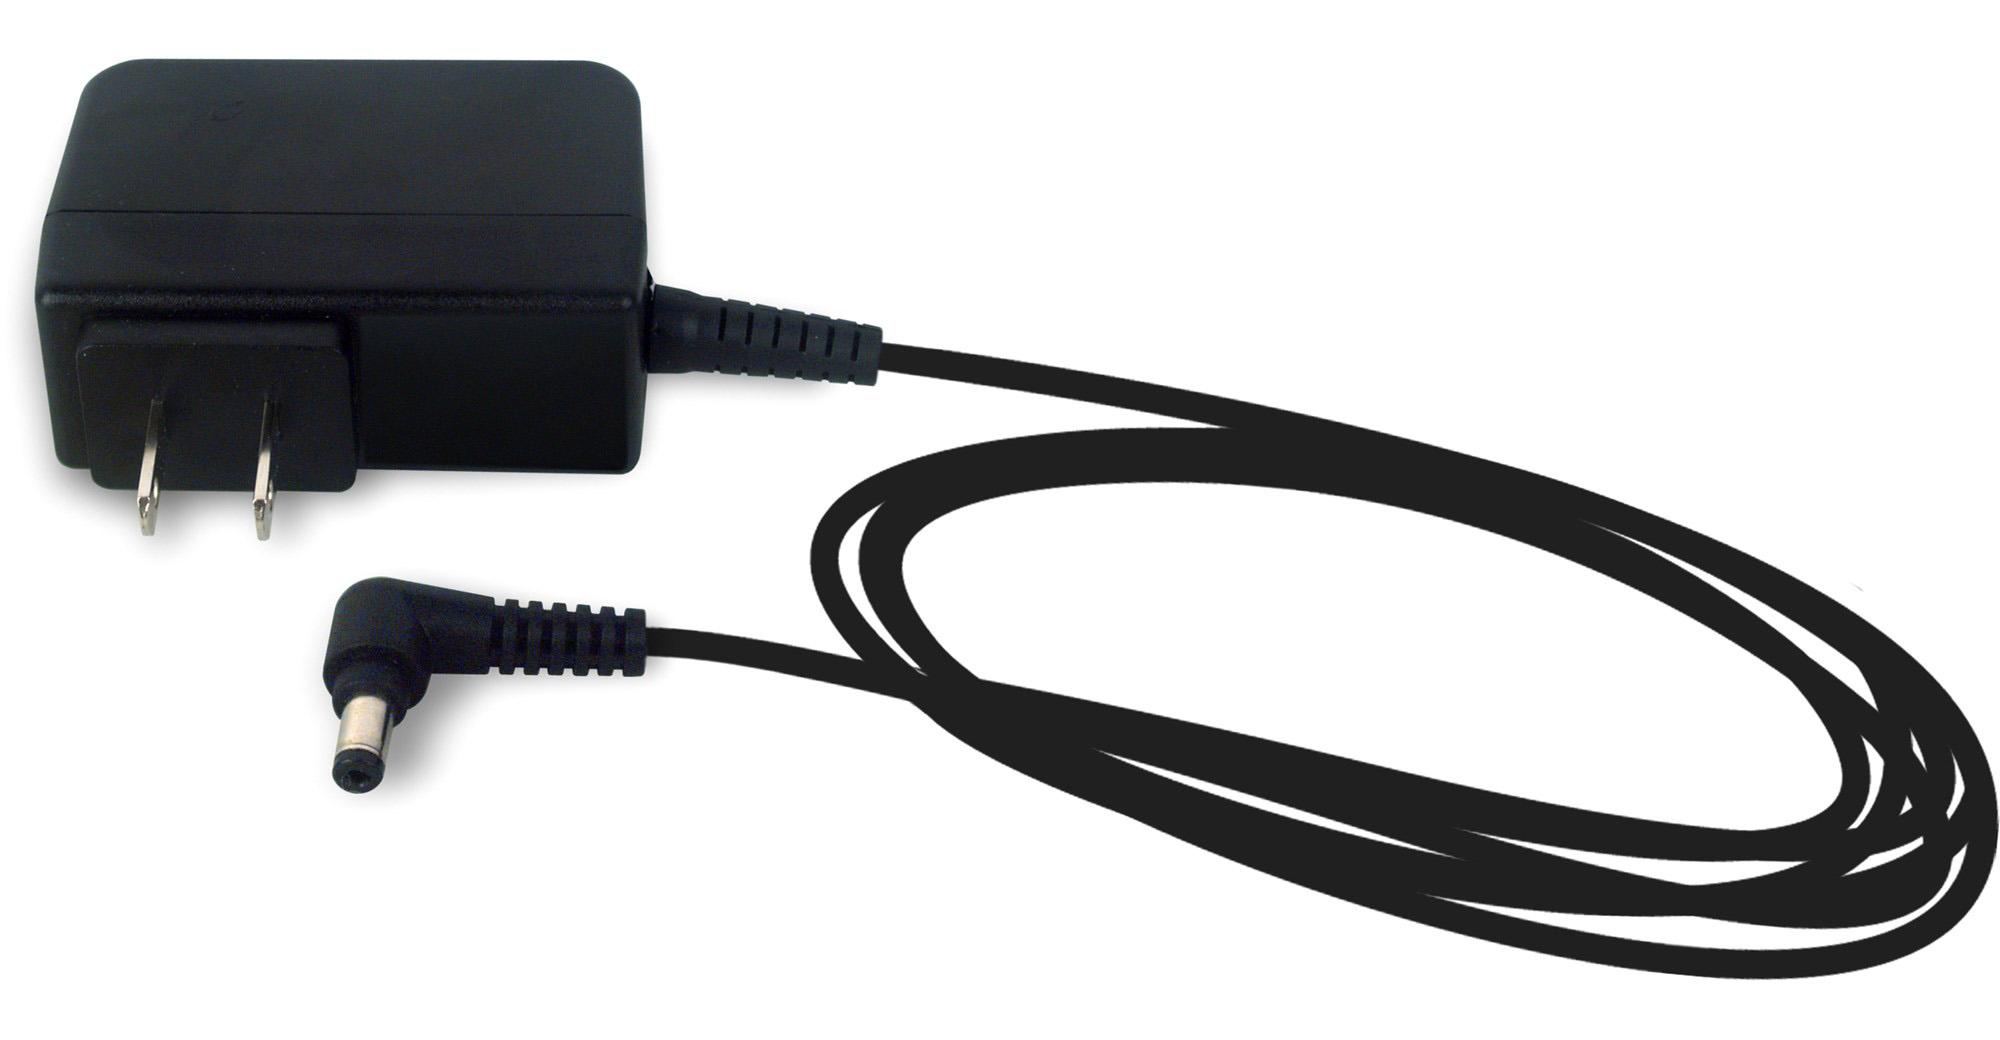 Зарядное устройство для iRobot Braava 380 (4408471)